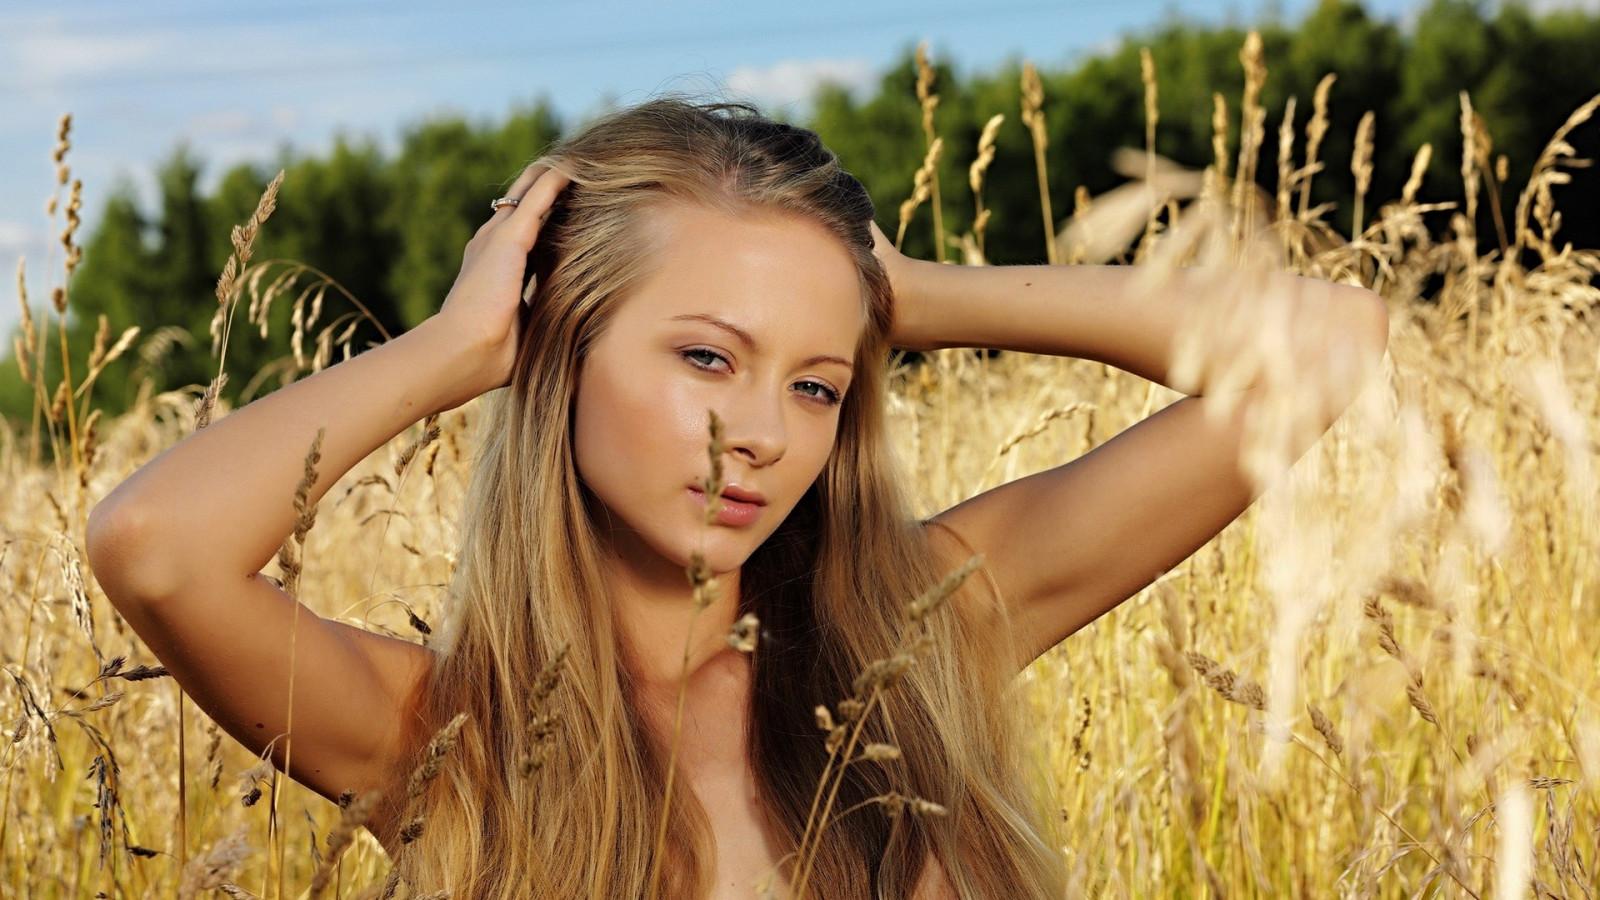 фото голая молодая девушки про попу